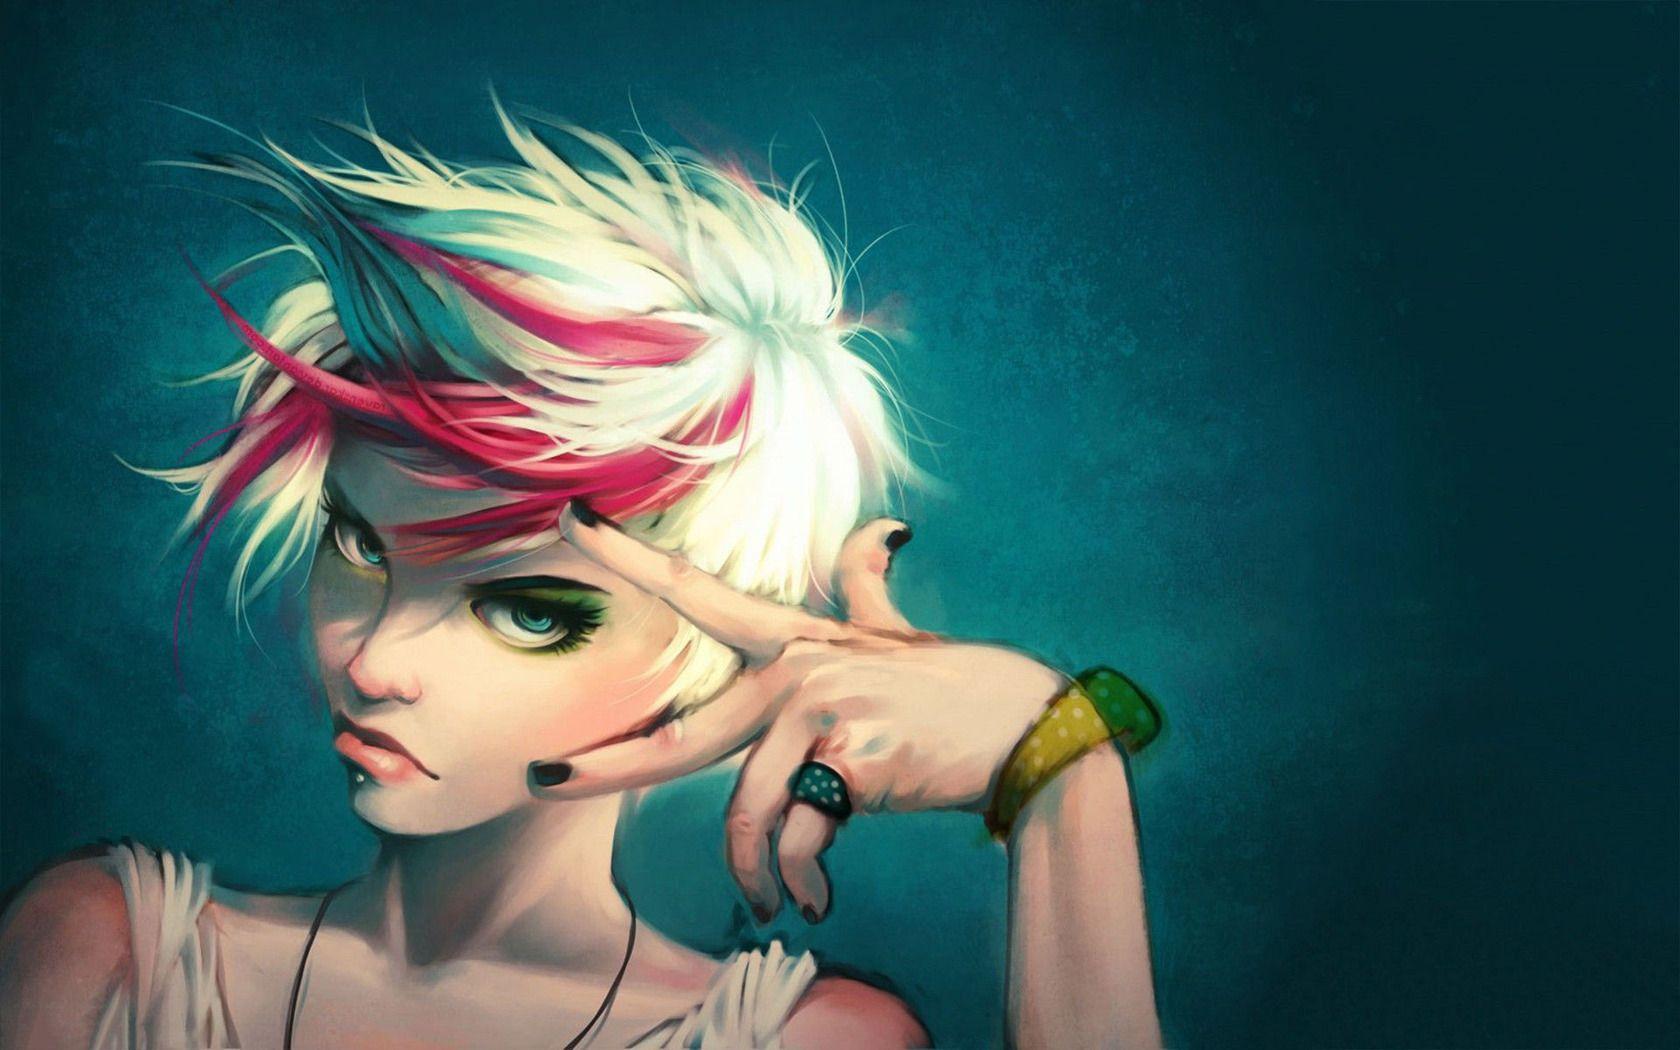 Punk Girl Style Imashon Com Punk Girl Monochrome Art Girl Cartoon